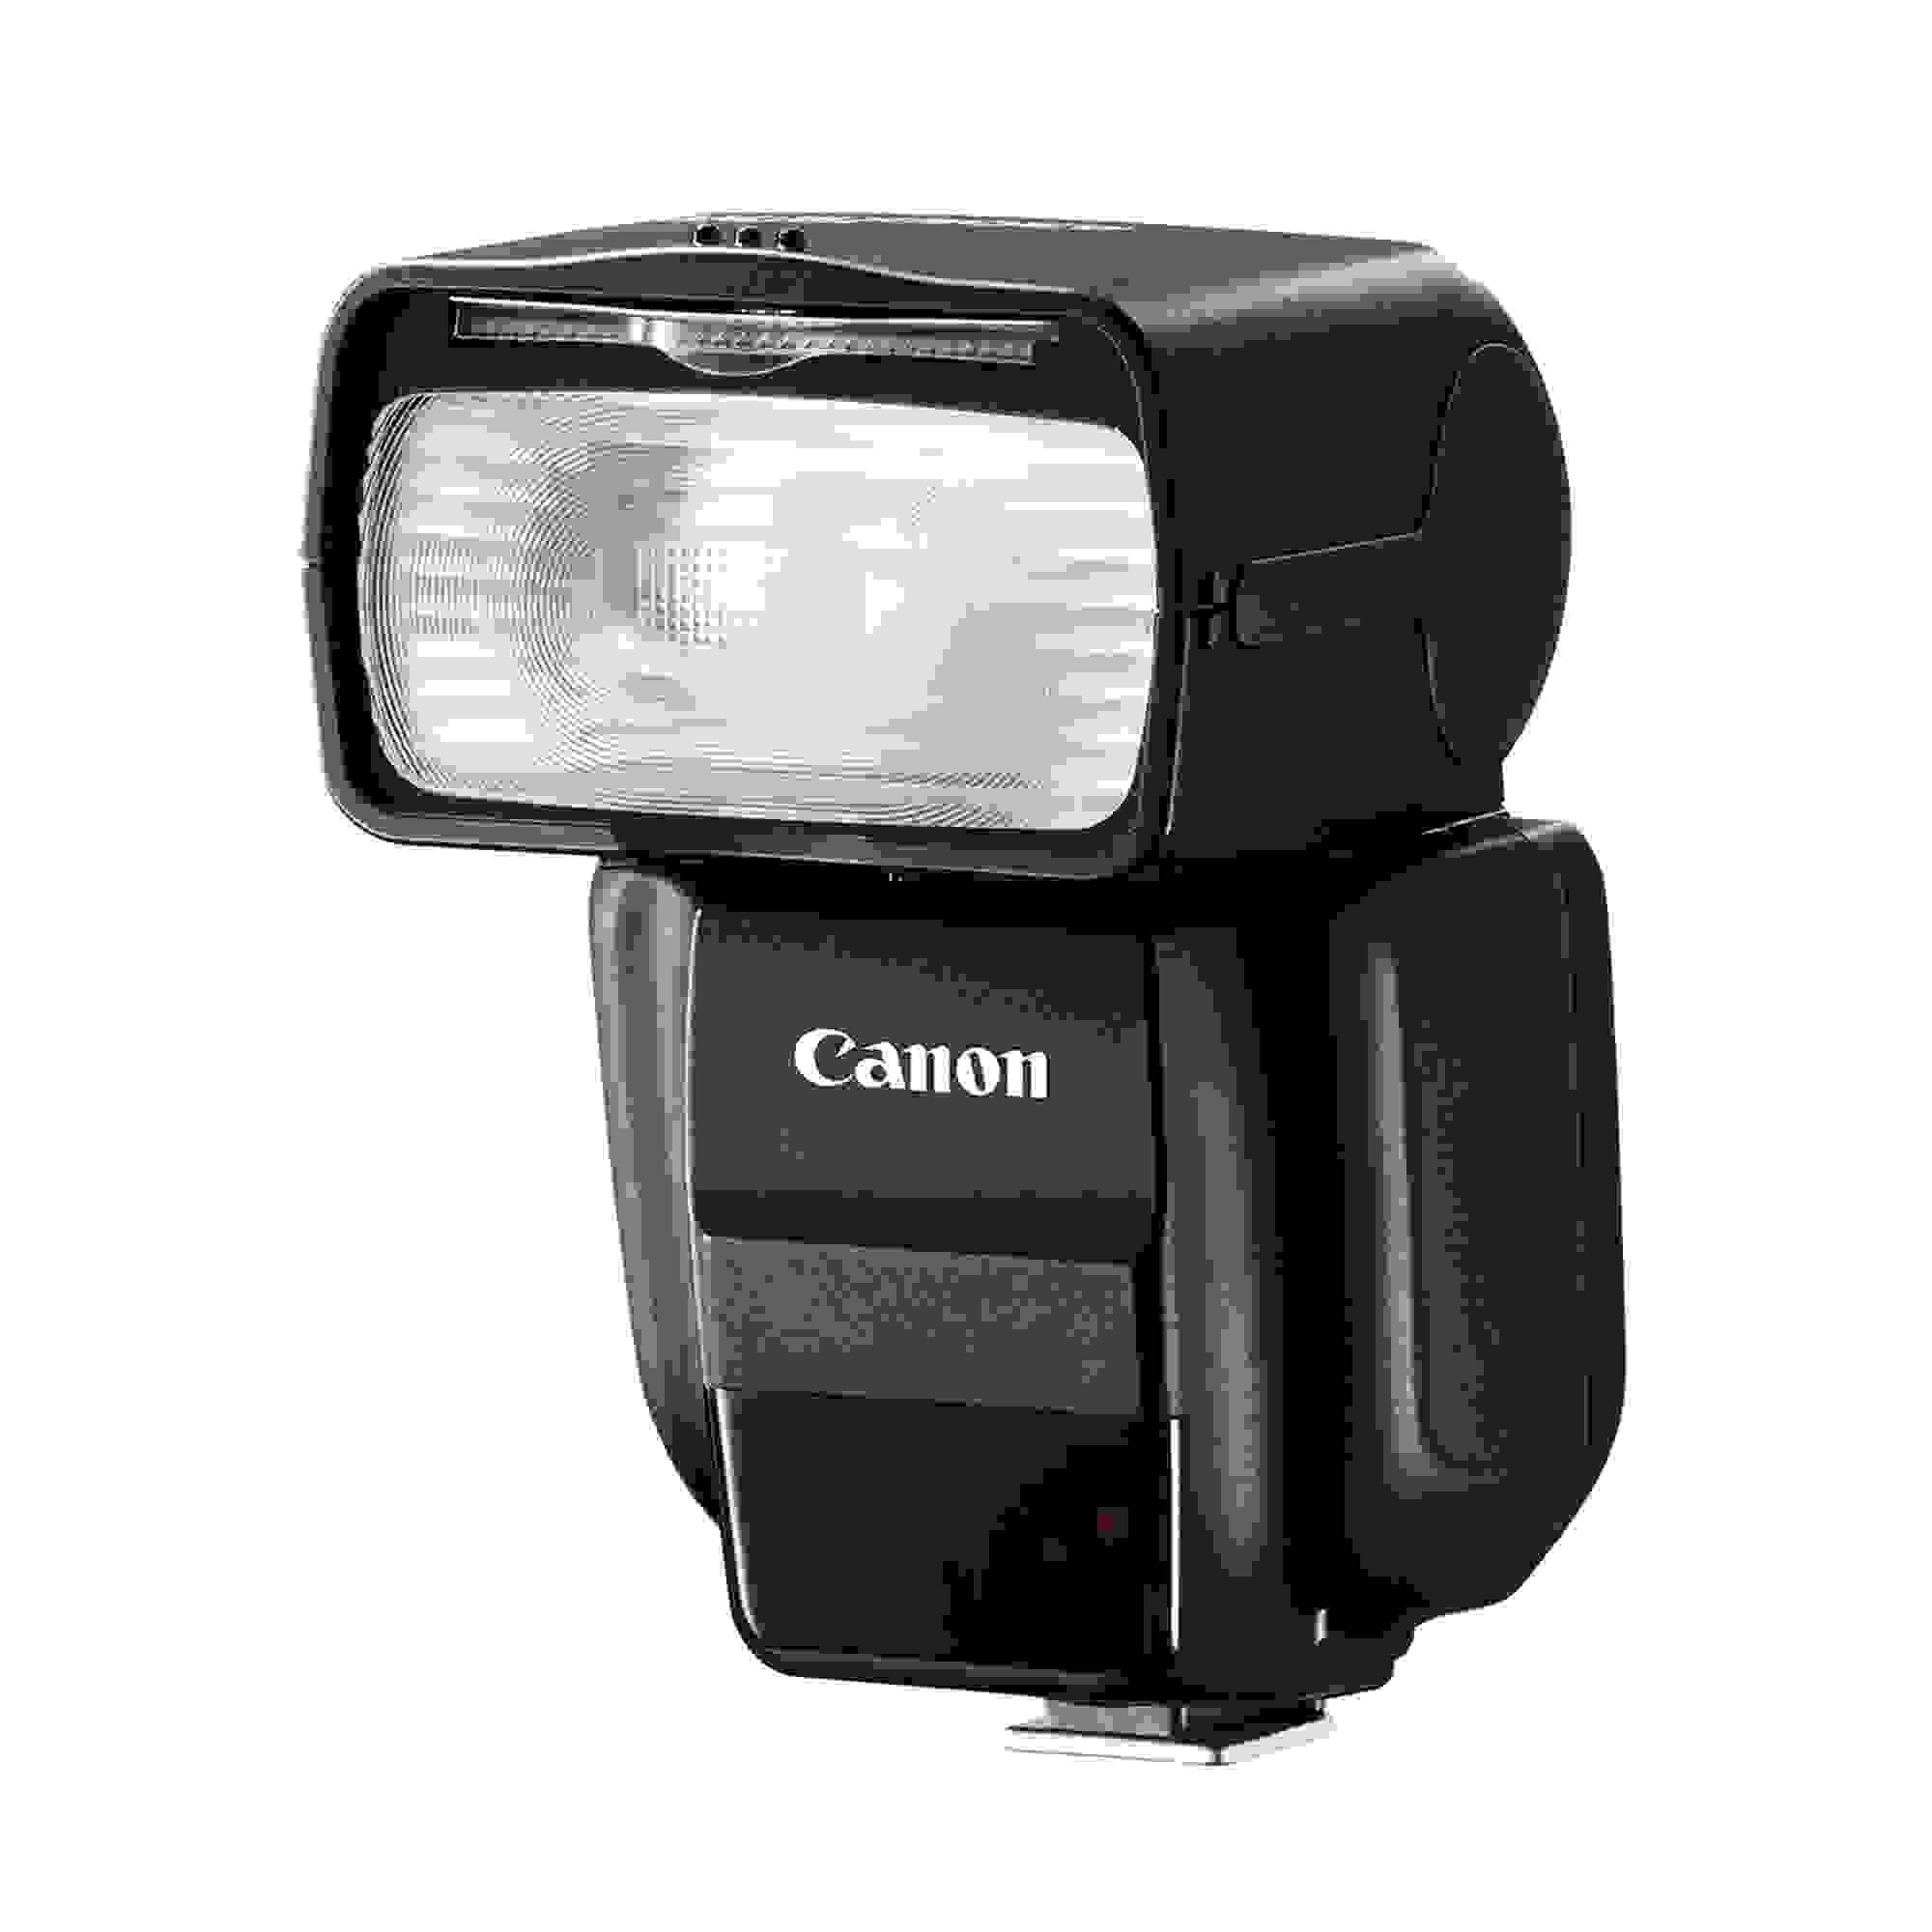 CANON SPEEDLITE 430EX III-RT CAMERA FLSH